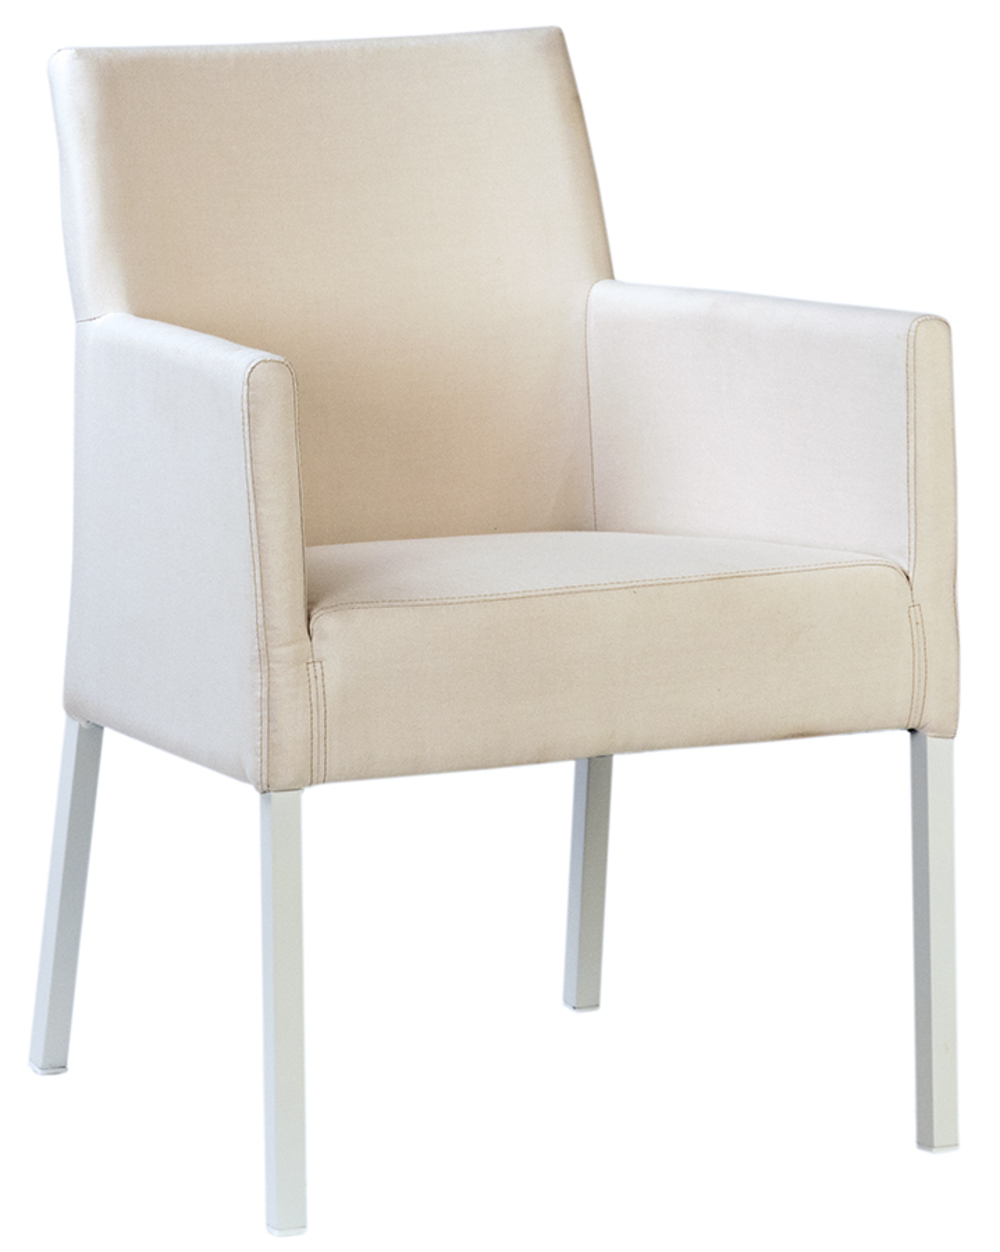 Dovetail Furniture - Twigg Chair